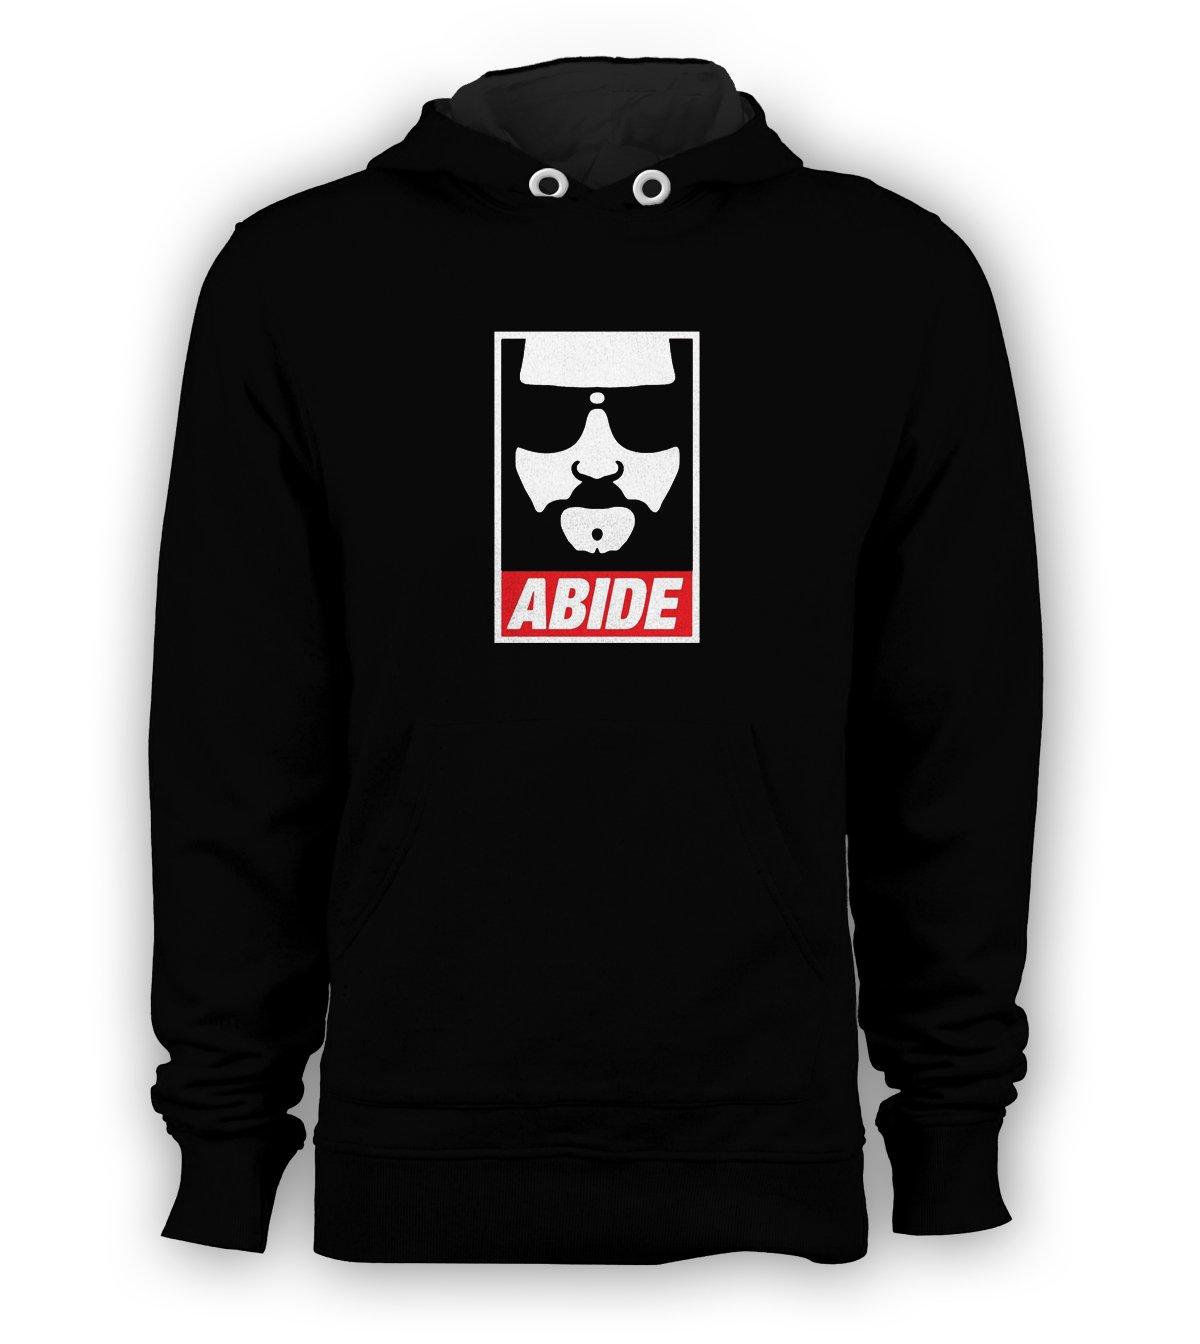 Abide Big Face Lebowski Pullover Hoodie Men Sweatshirts Size S to 3XL New Black